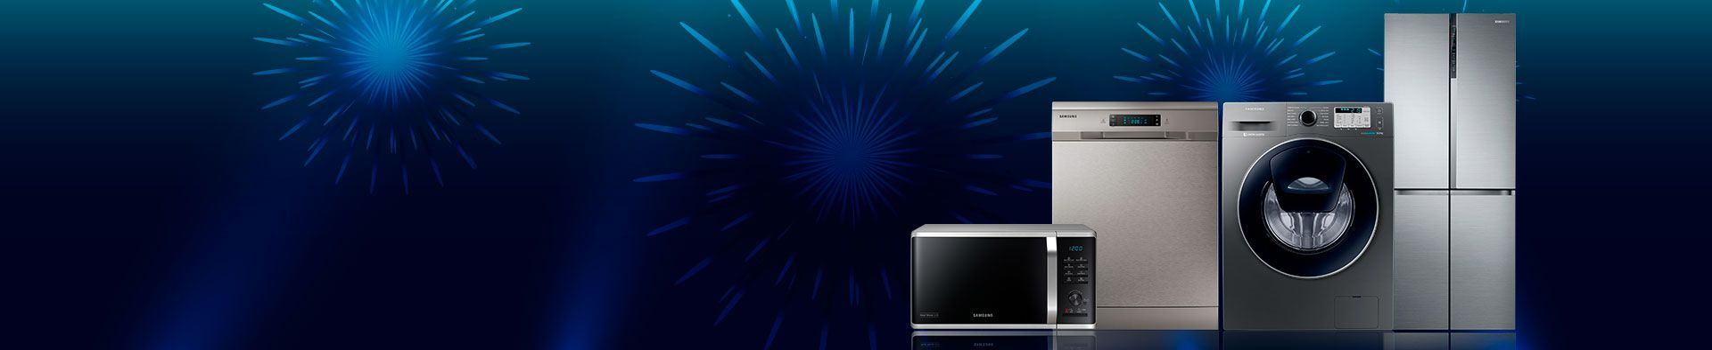 Pack électro Samsung Tunisie